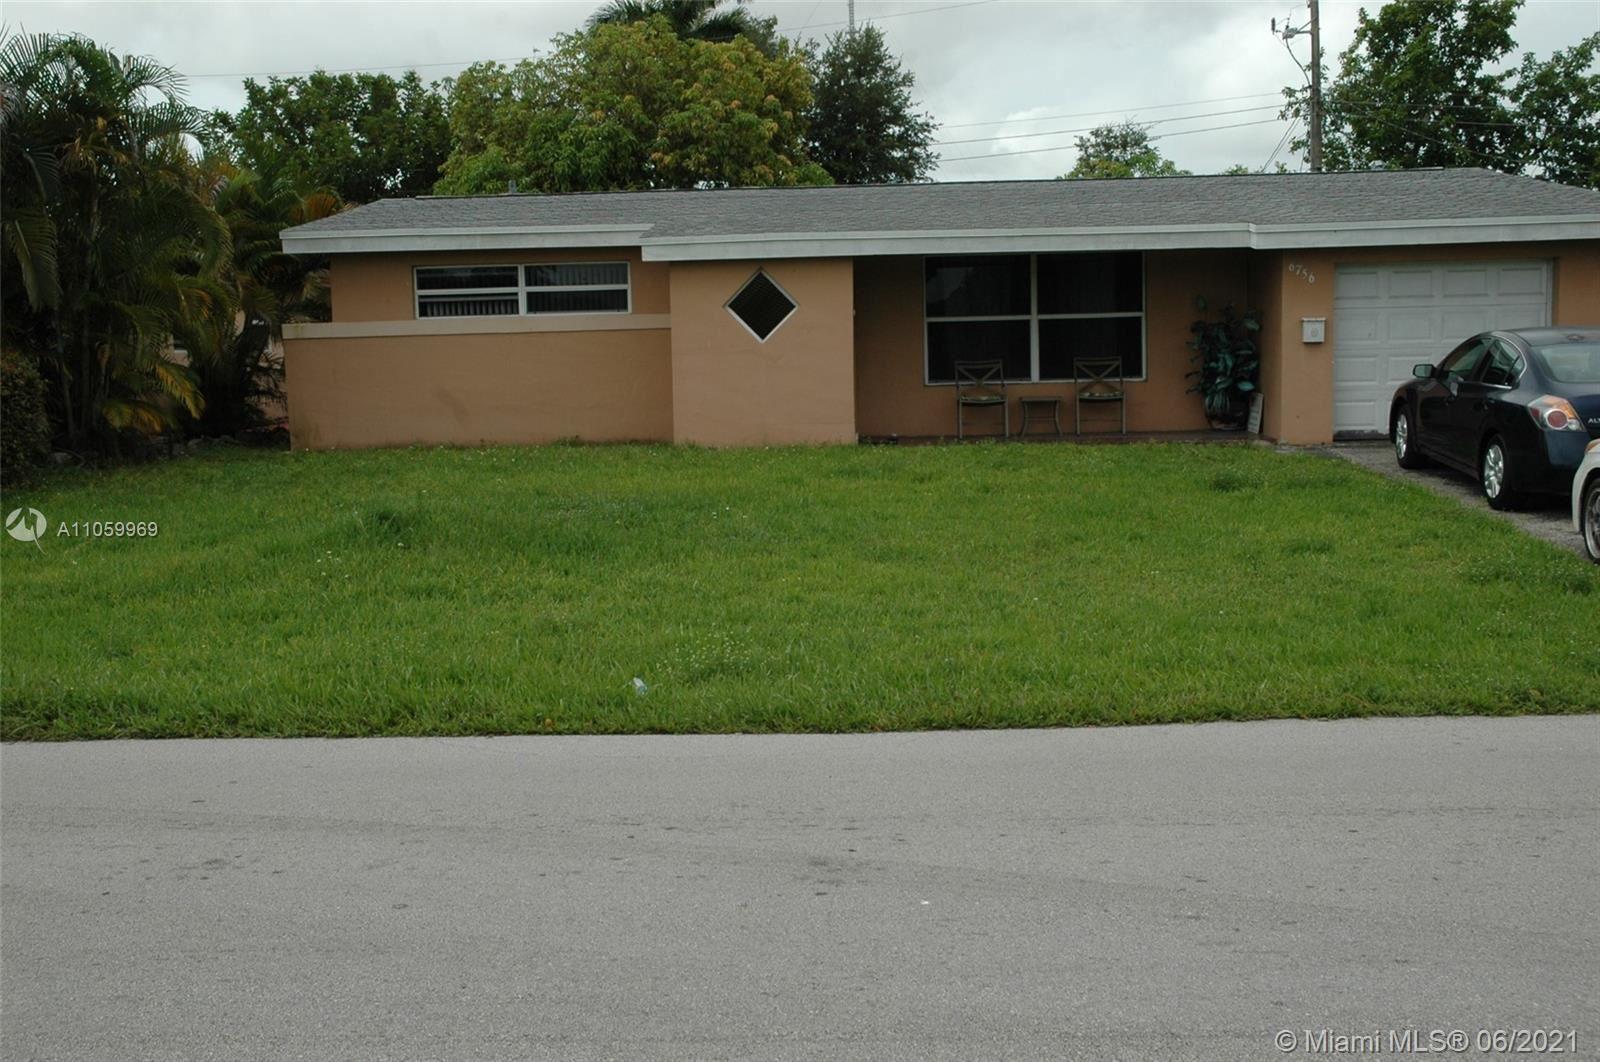 6756 SW 33rd St, Miramar, FL 33023 - #: A11059969